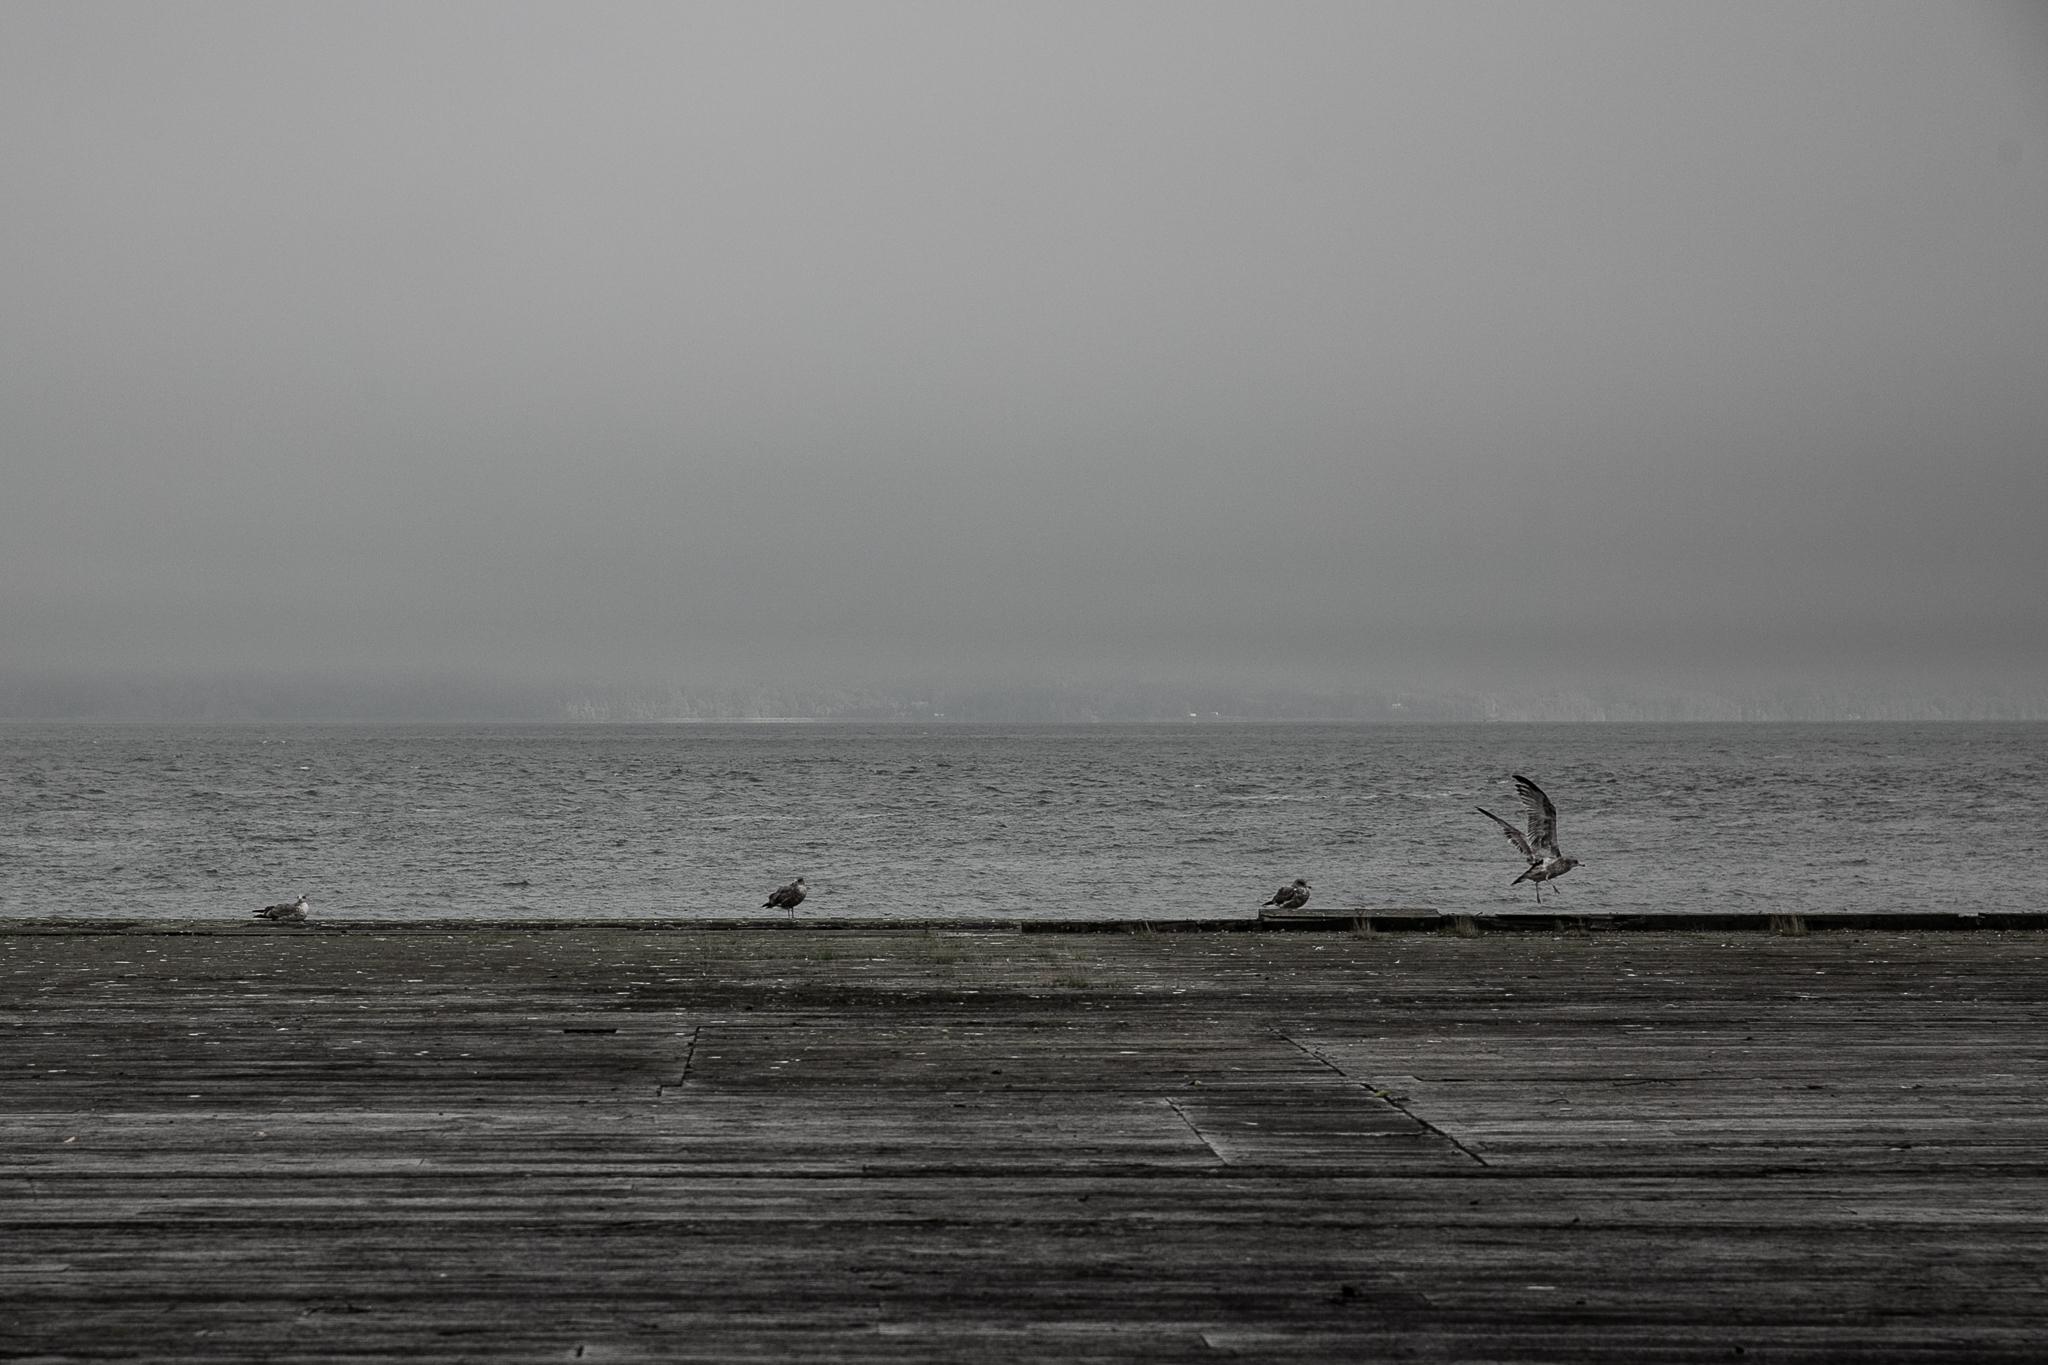 astoria birds-1.jpg